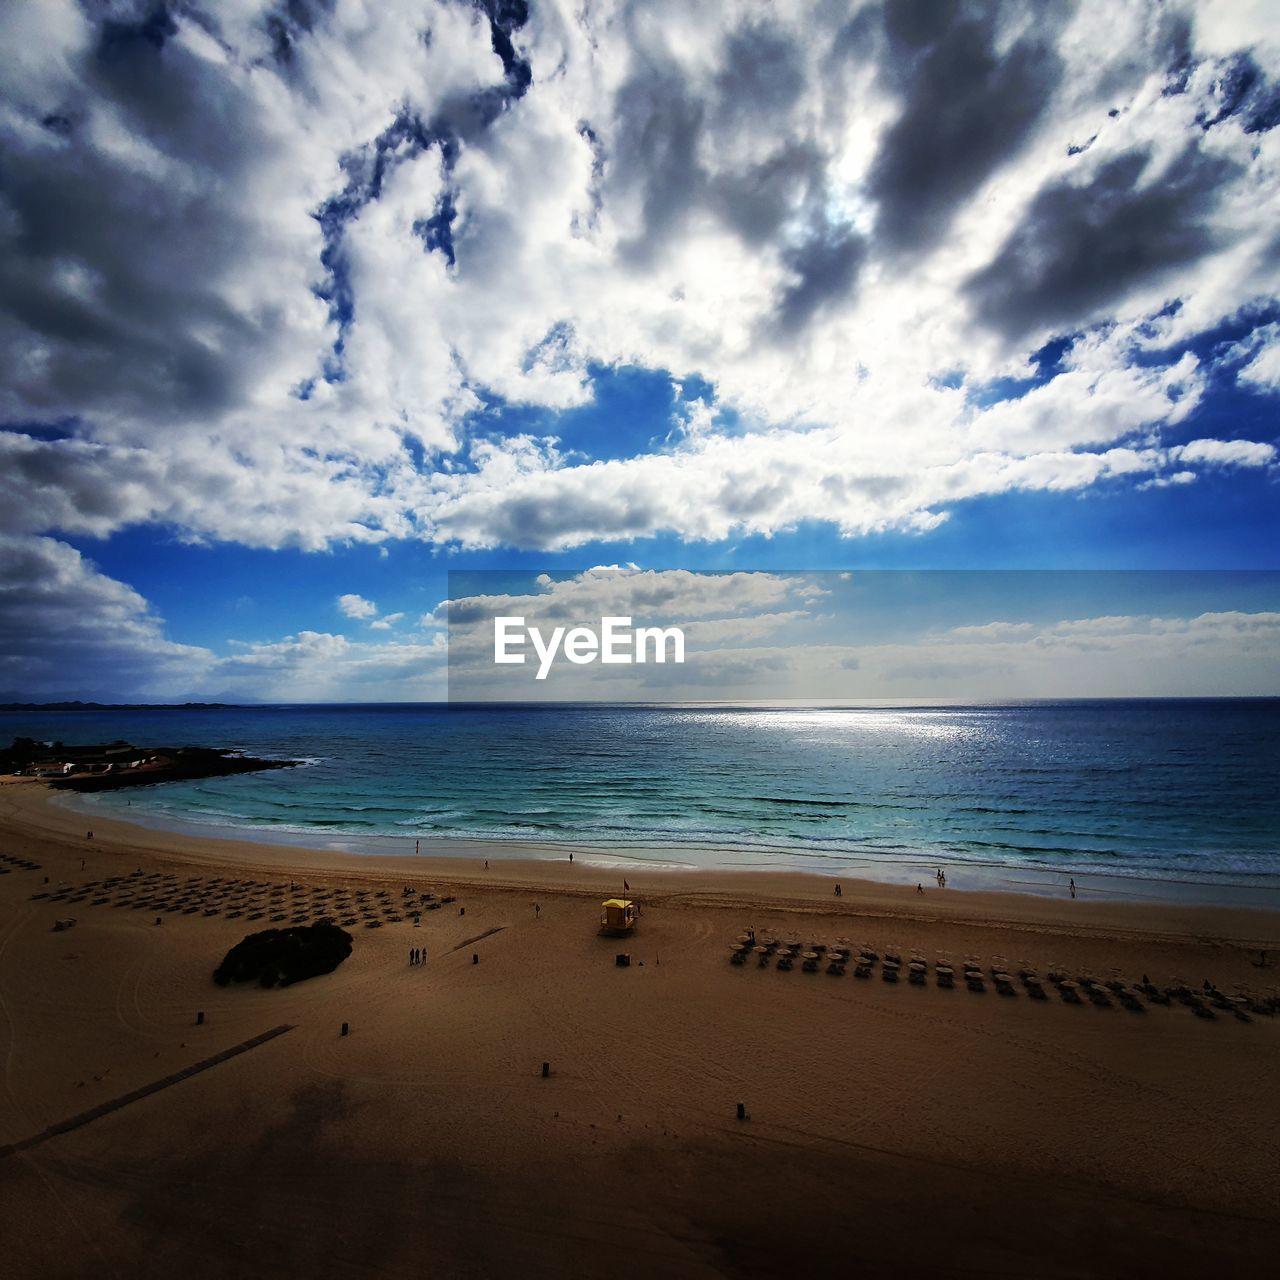 sea, beach, water, sky, land, cloud - sky, horizon over water, horizon, sand, beauty in nature, scenics - nature, tranquil scene, nature, tranquility, day, idyllic, non-urban scene, holiday, trip, outdoors